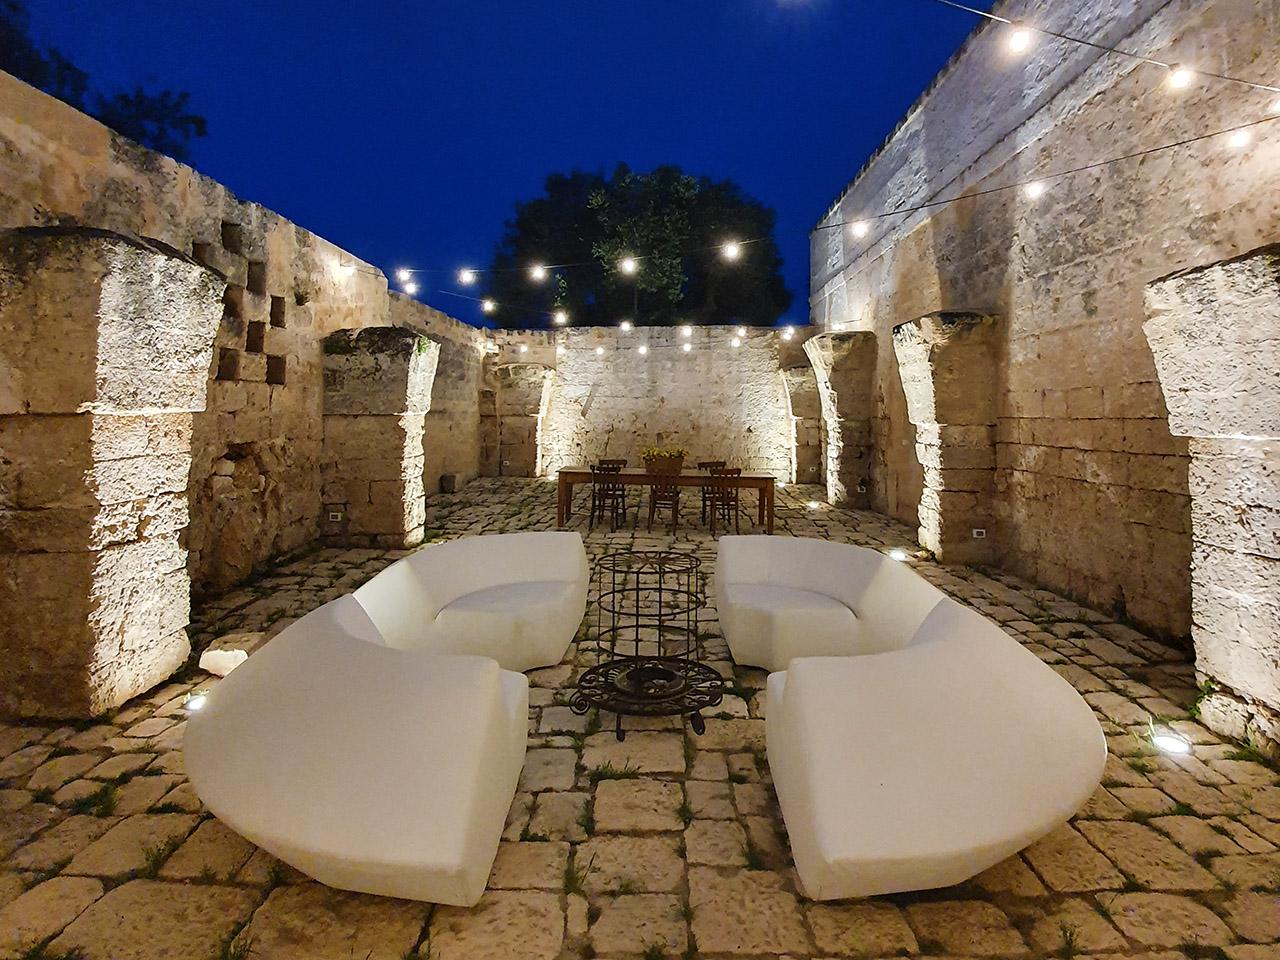 costruzioni restauri sirio ostuni restauro ristrutturazione masseria mangiamuso ostuni 20200509 202423